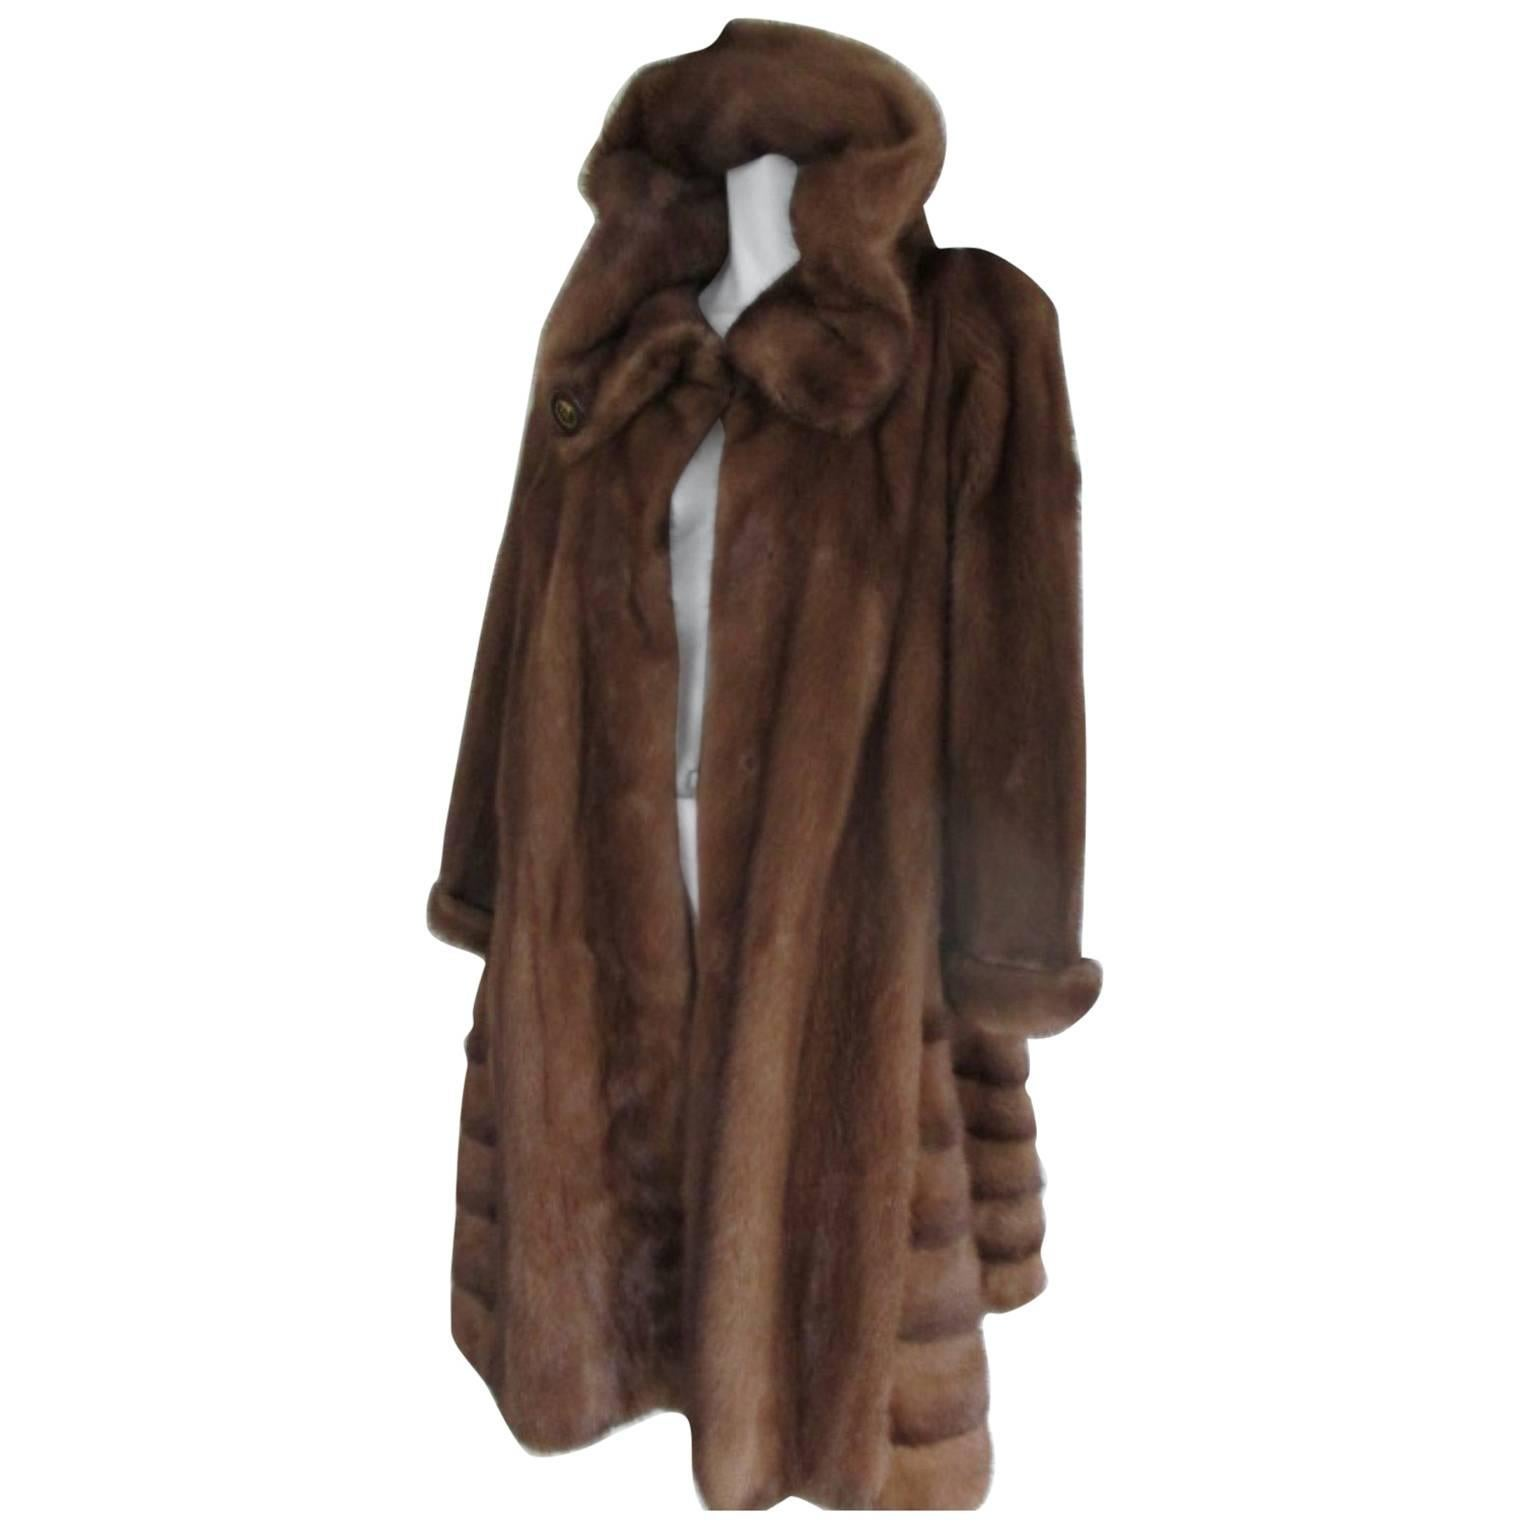 Black Coyote Fur Coat Neiman Marcus >> Vintage Fur Coats 919 For Sale On 1stdibs